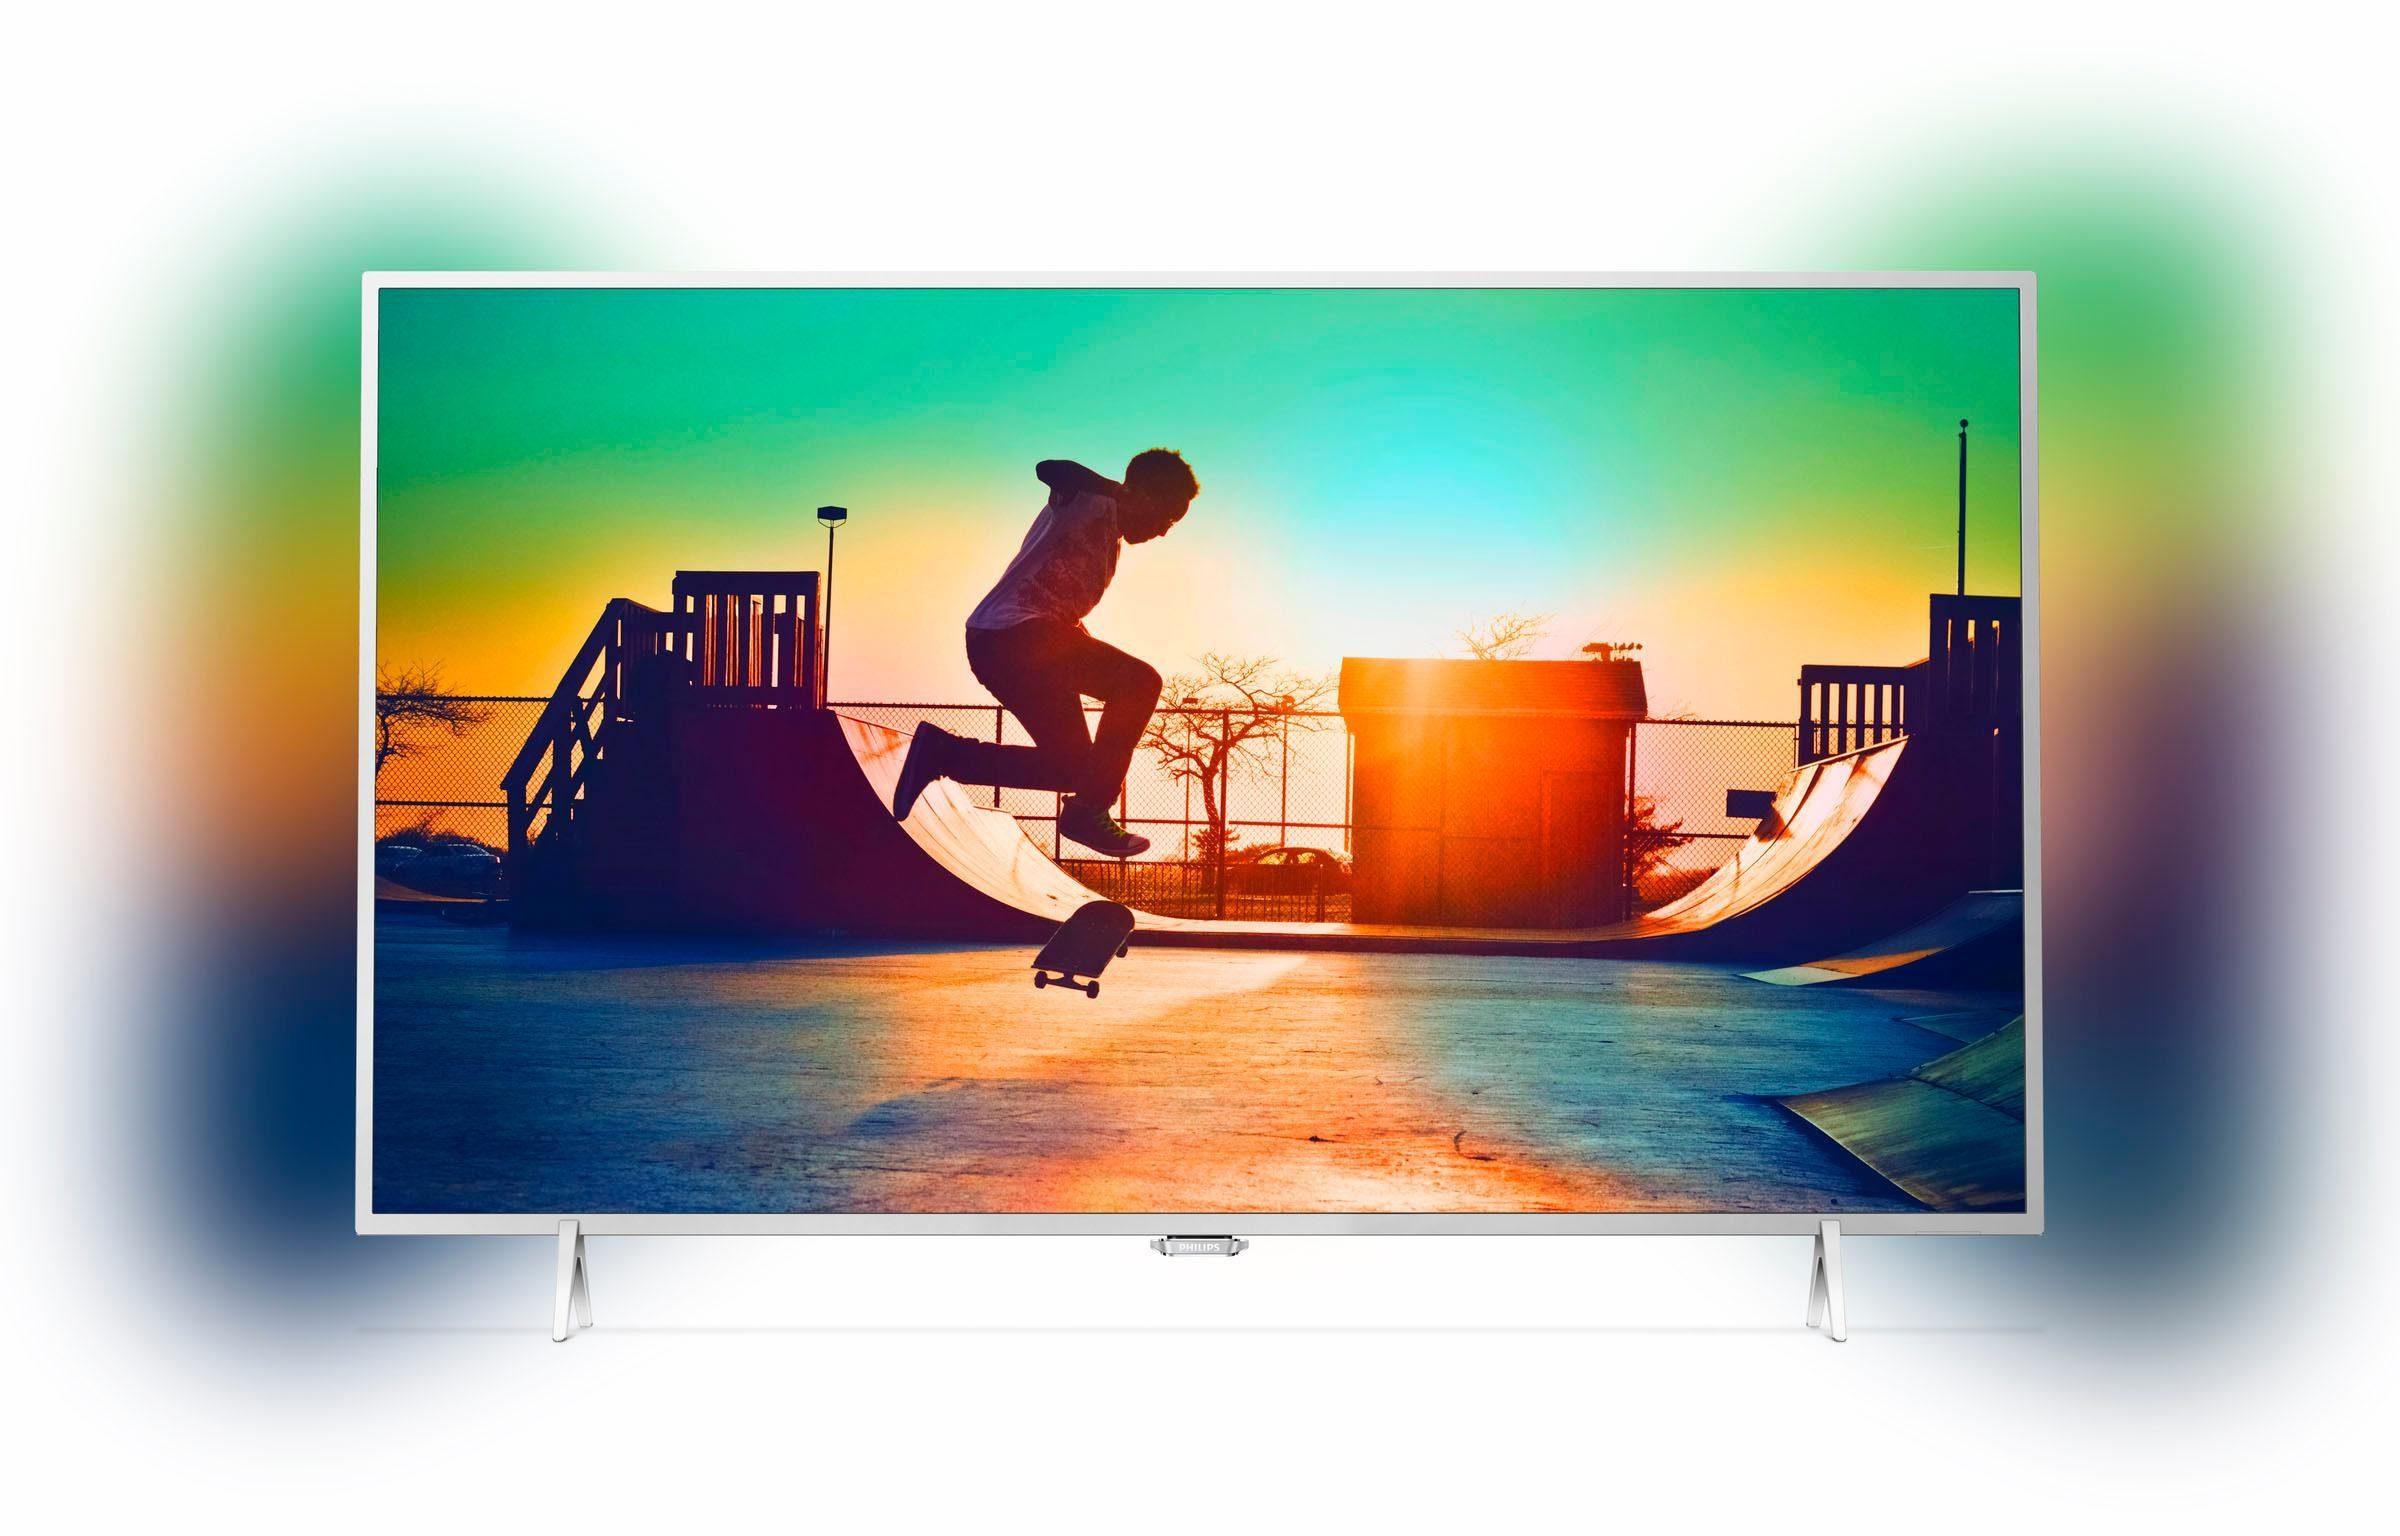 Philips 32PFS6402/12 LED-Fernseher (80 cm/32 Zoll, Full HD, Smart-TV, USB-Recording)